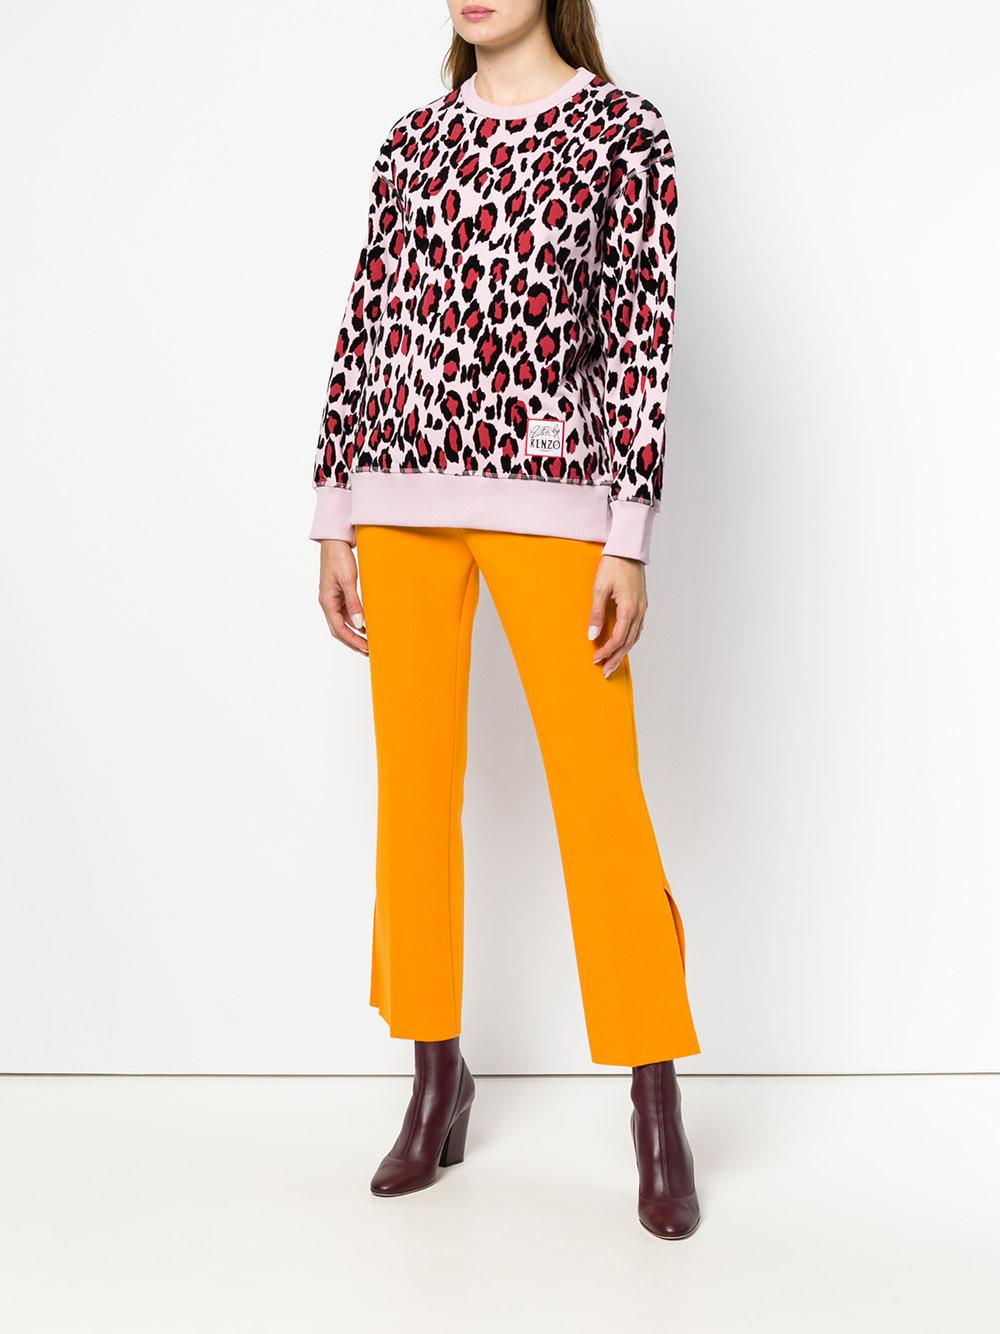 Kenzo leopard print sweatshirt $500